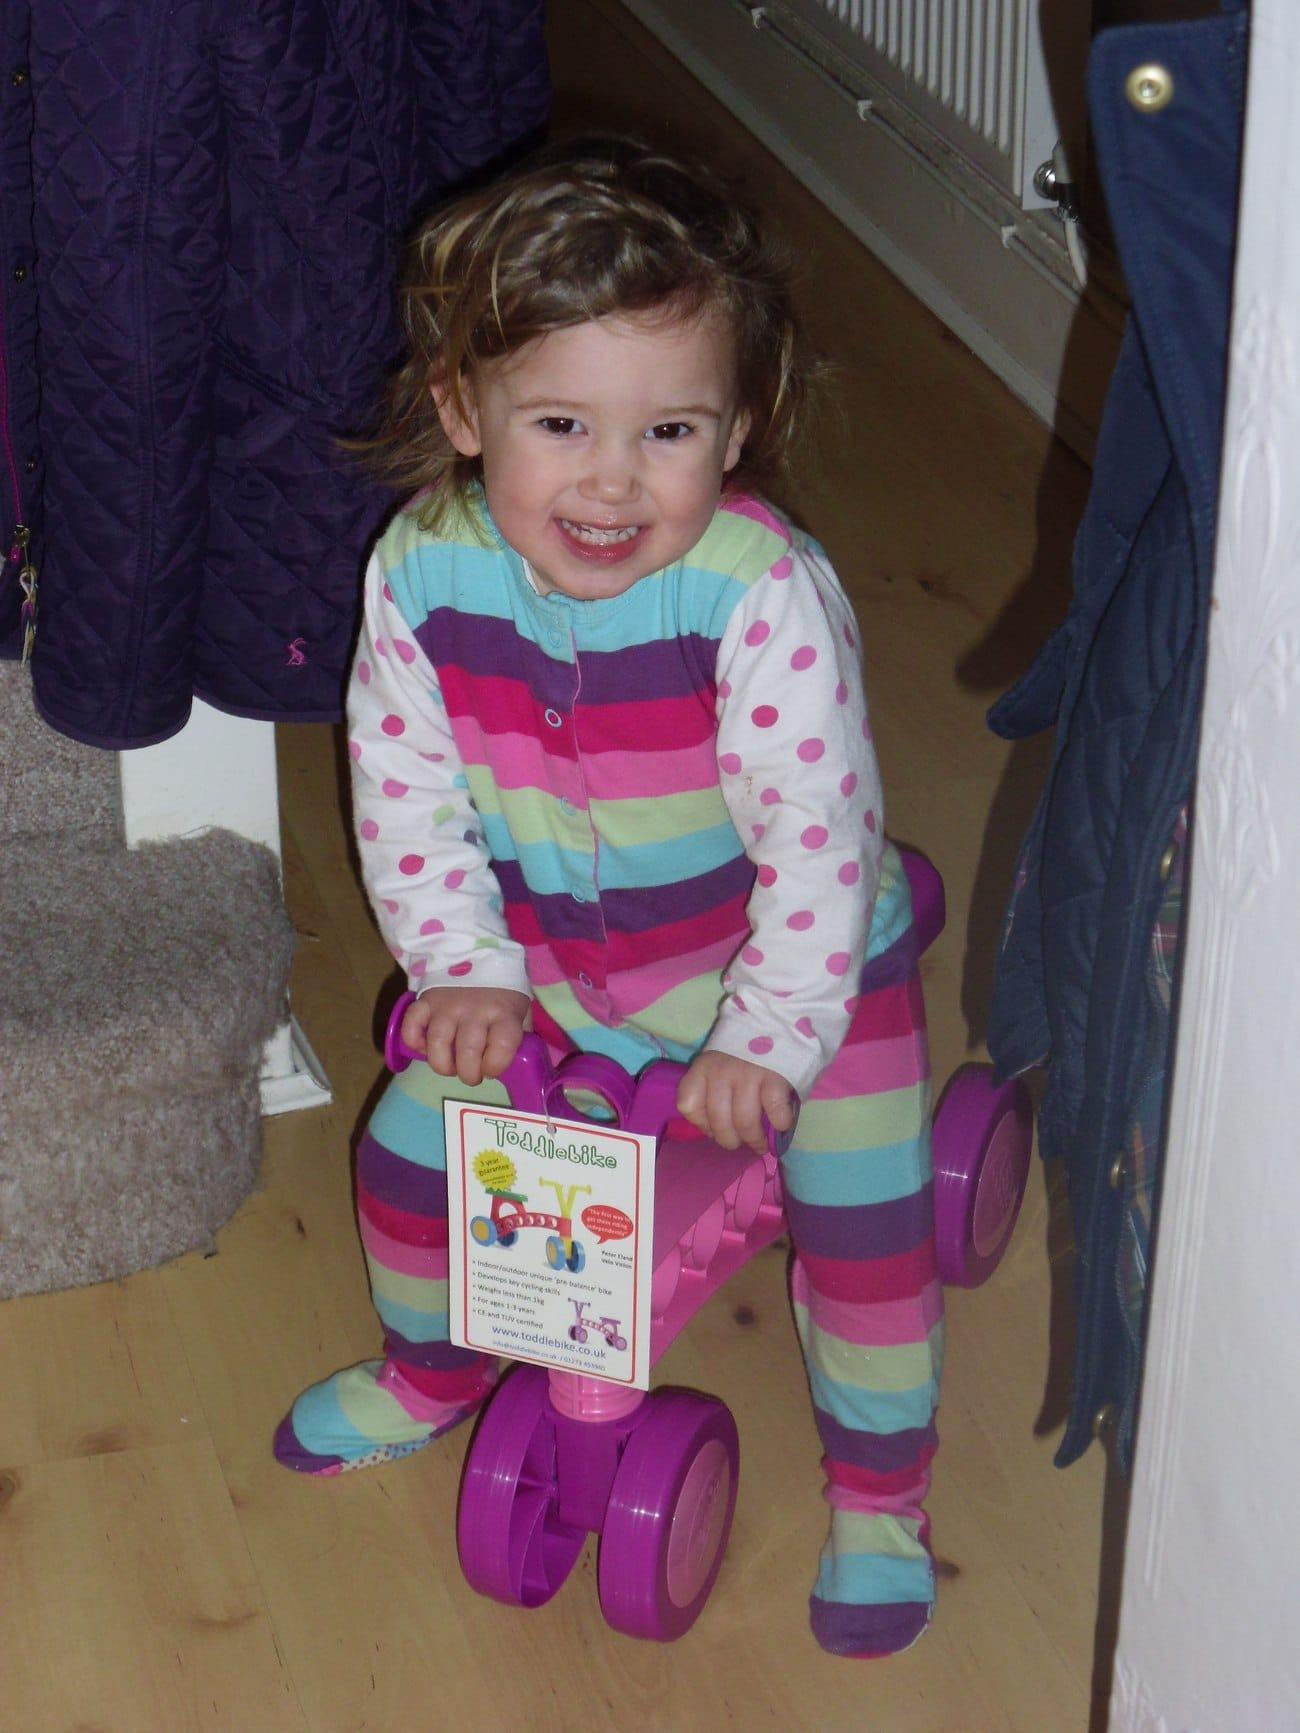 Loving her new Toddlebike!